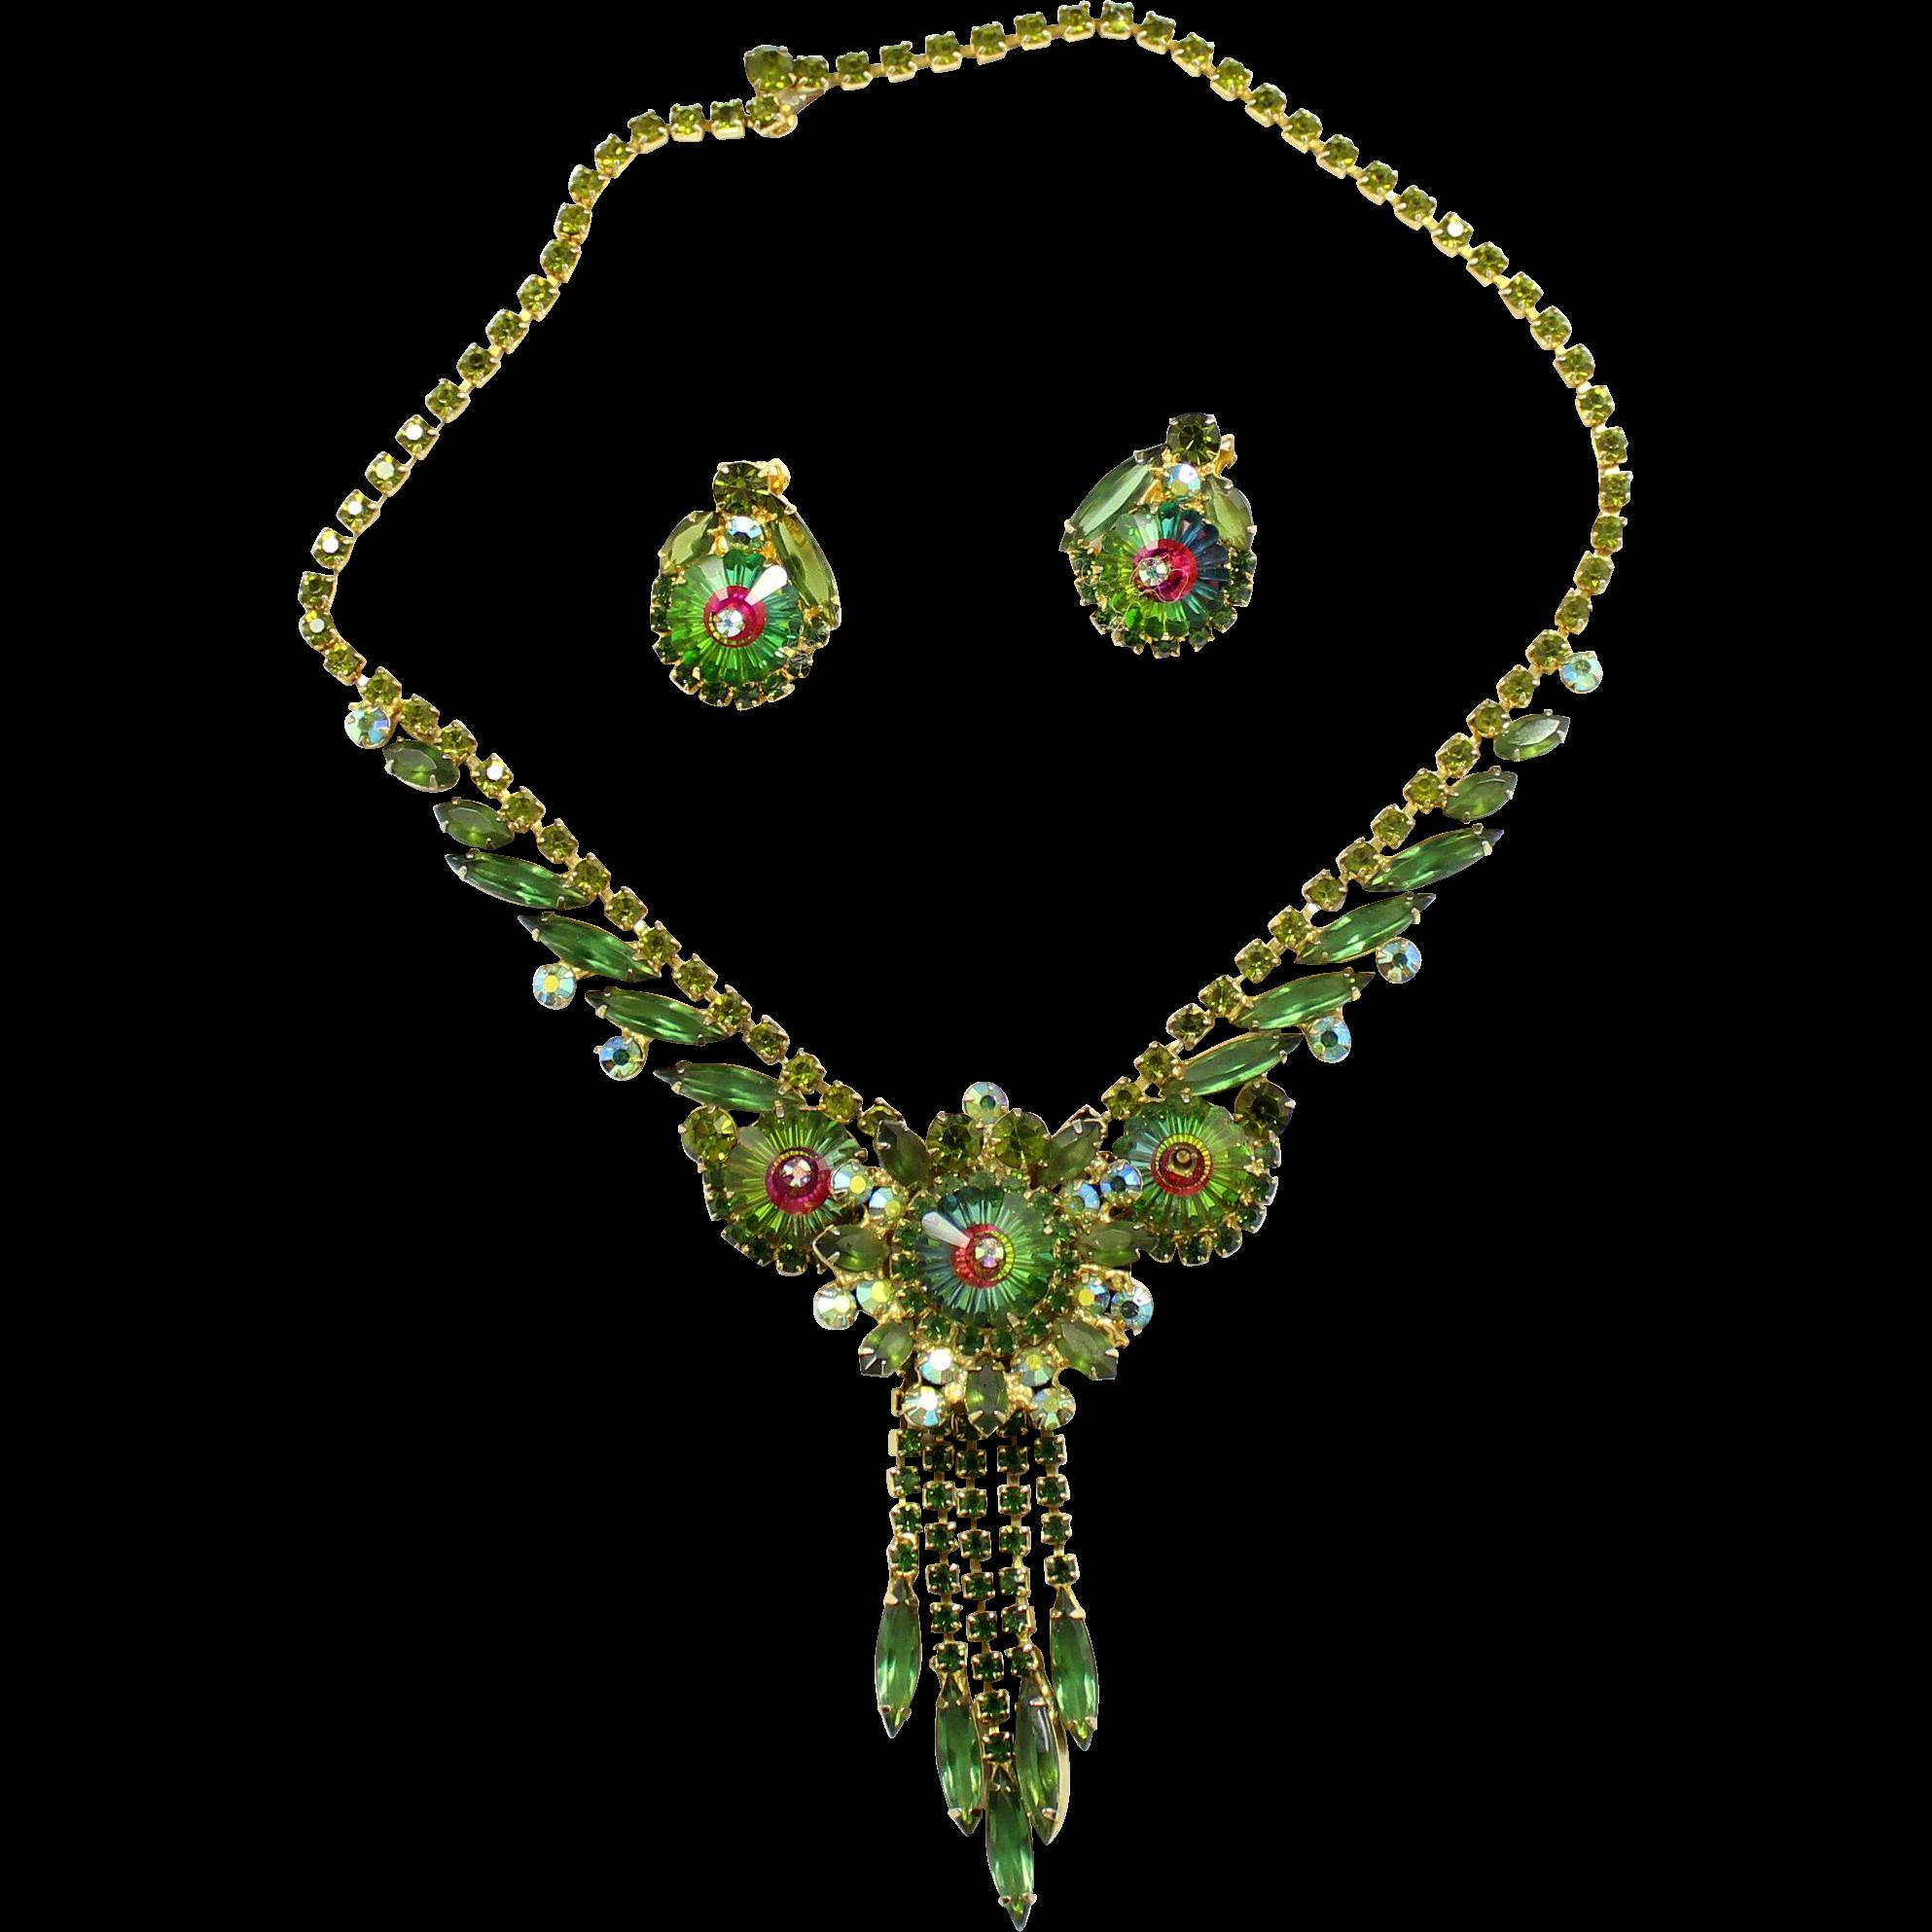 Vintage Juliana Book Piece Olivine Green Rhinestone Watermelon Margarita necklace Earrings Demi Parure